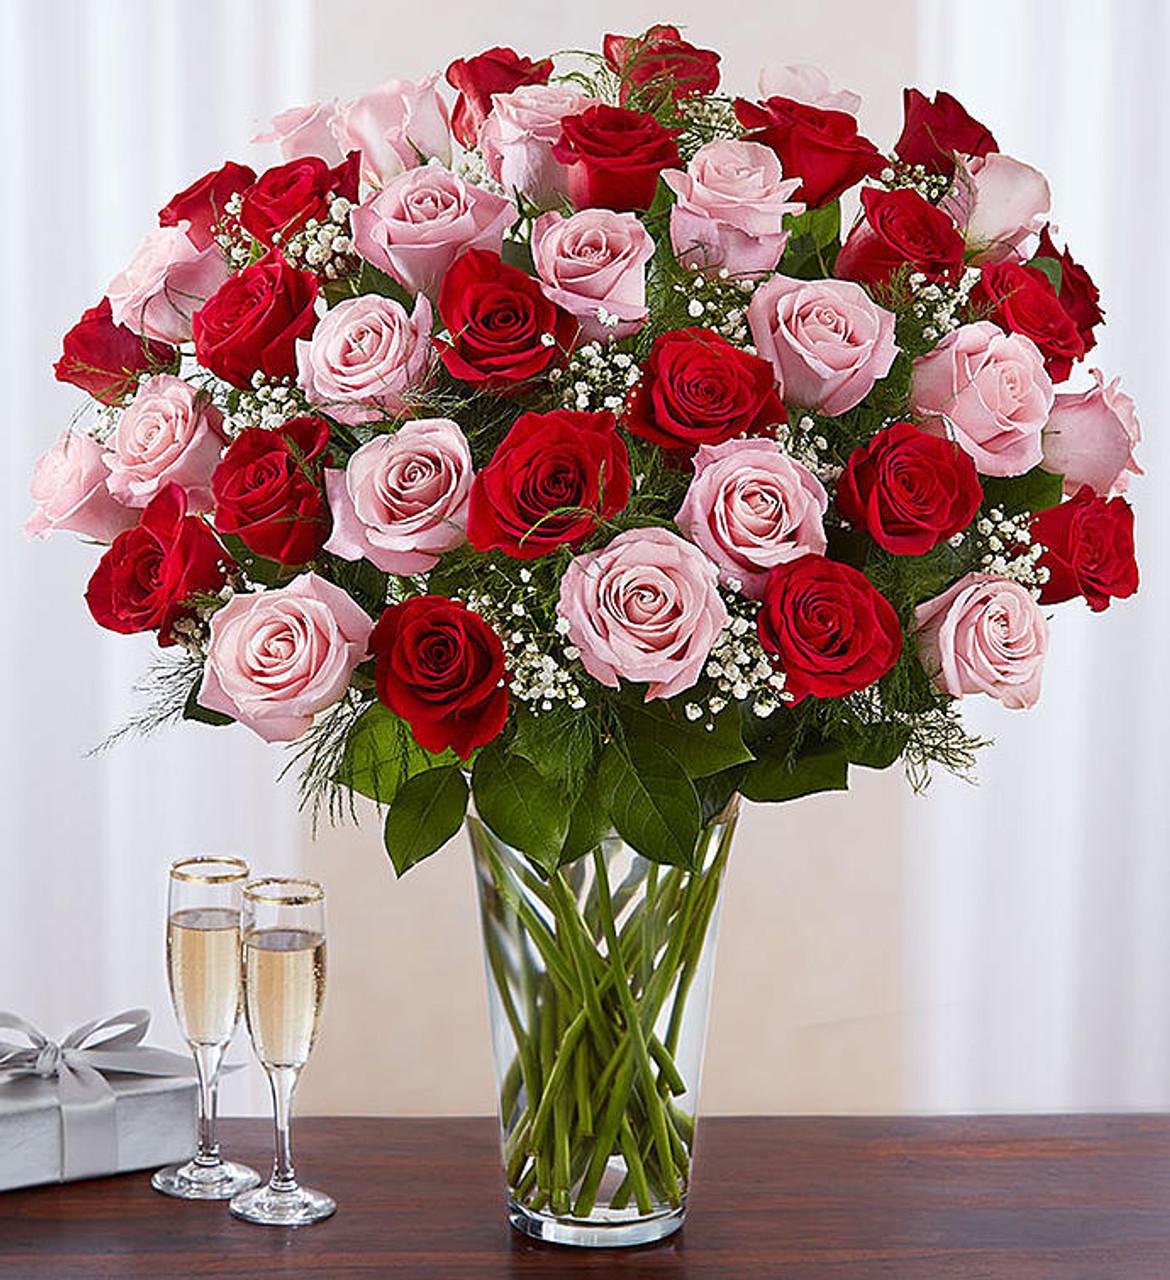 Ultimate Elegance Long Stem Pink Red Roses Conroys Flowers